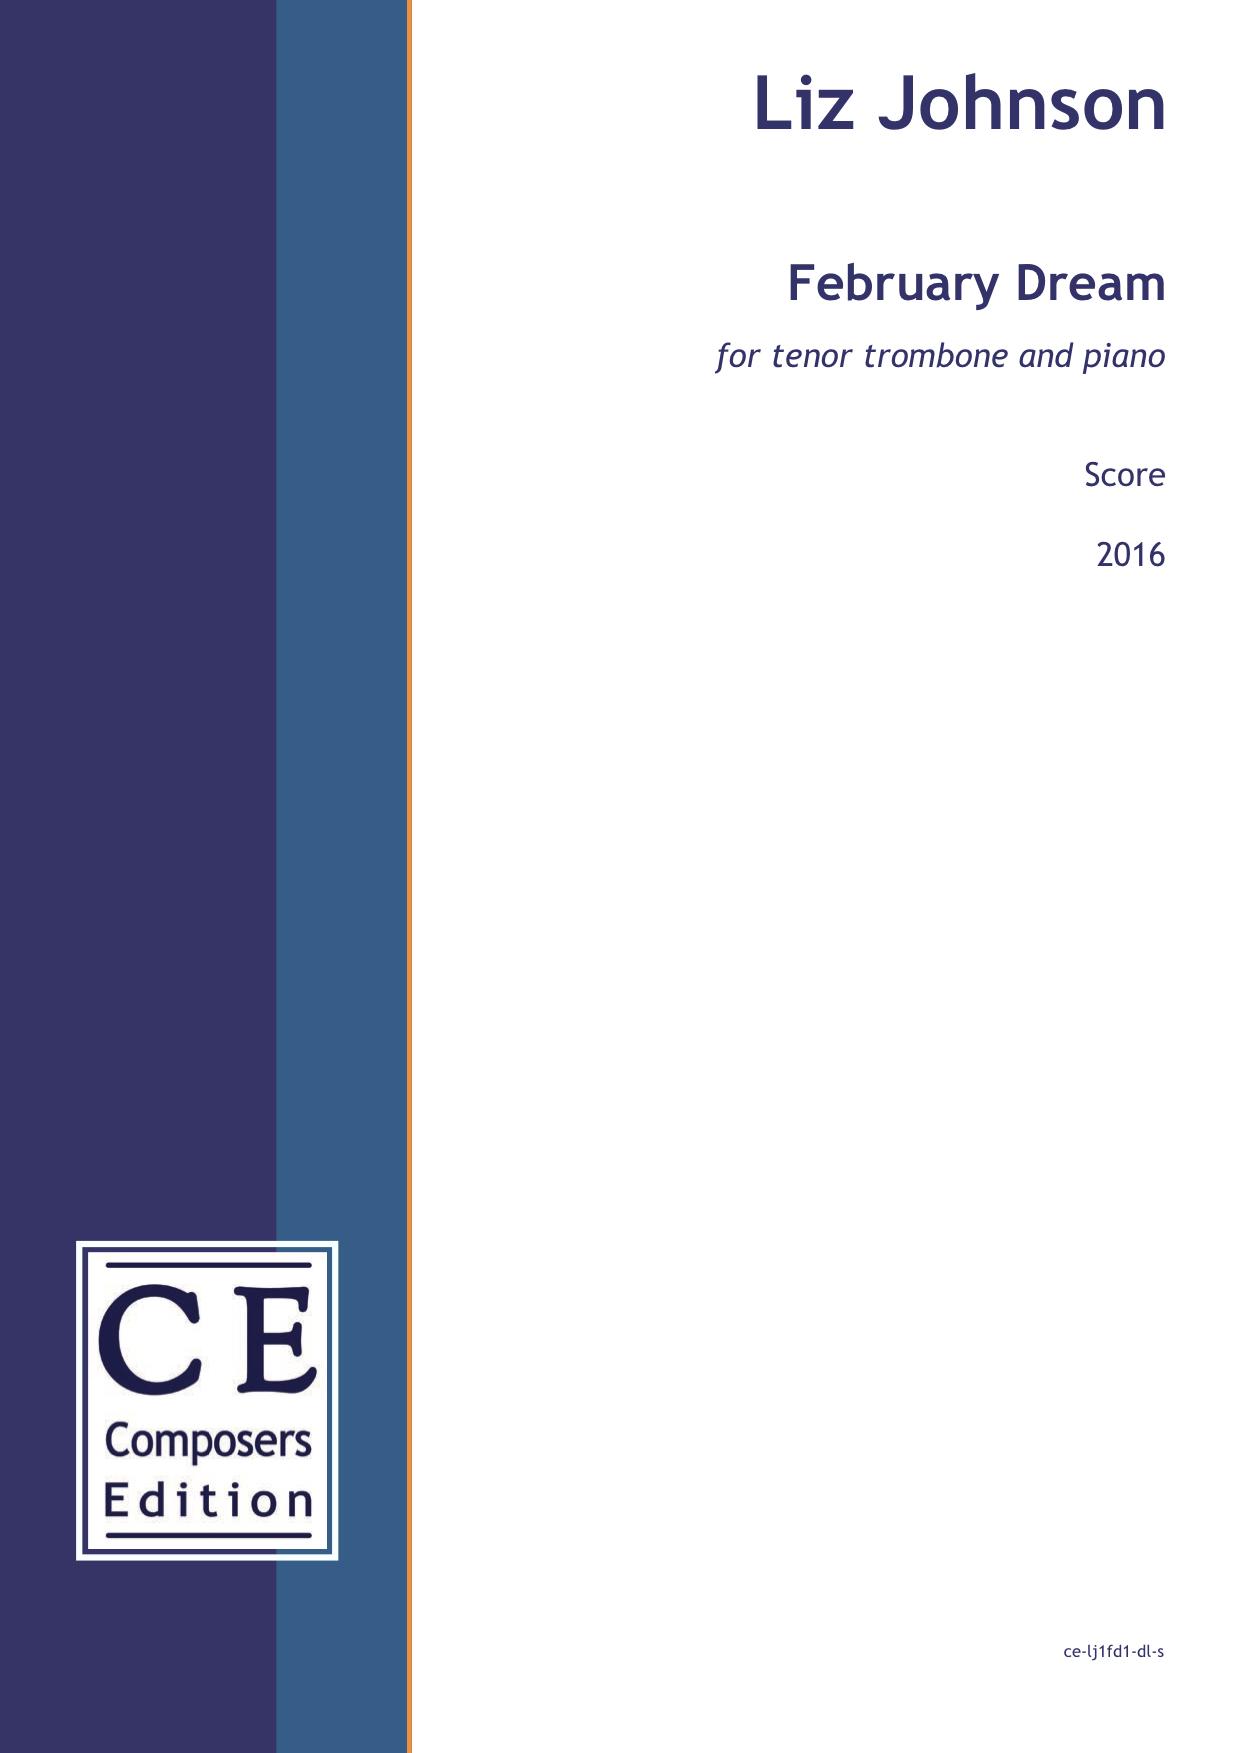 Liz Johnson: February Dream for tenor trombone and piano